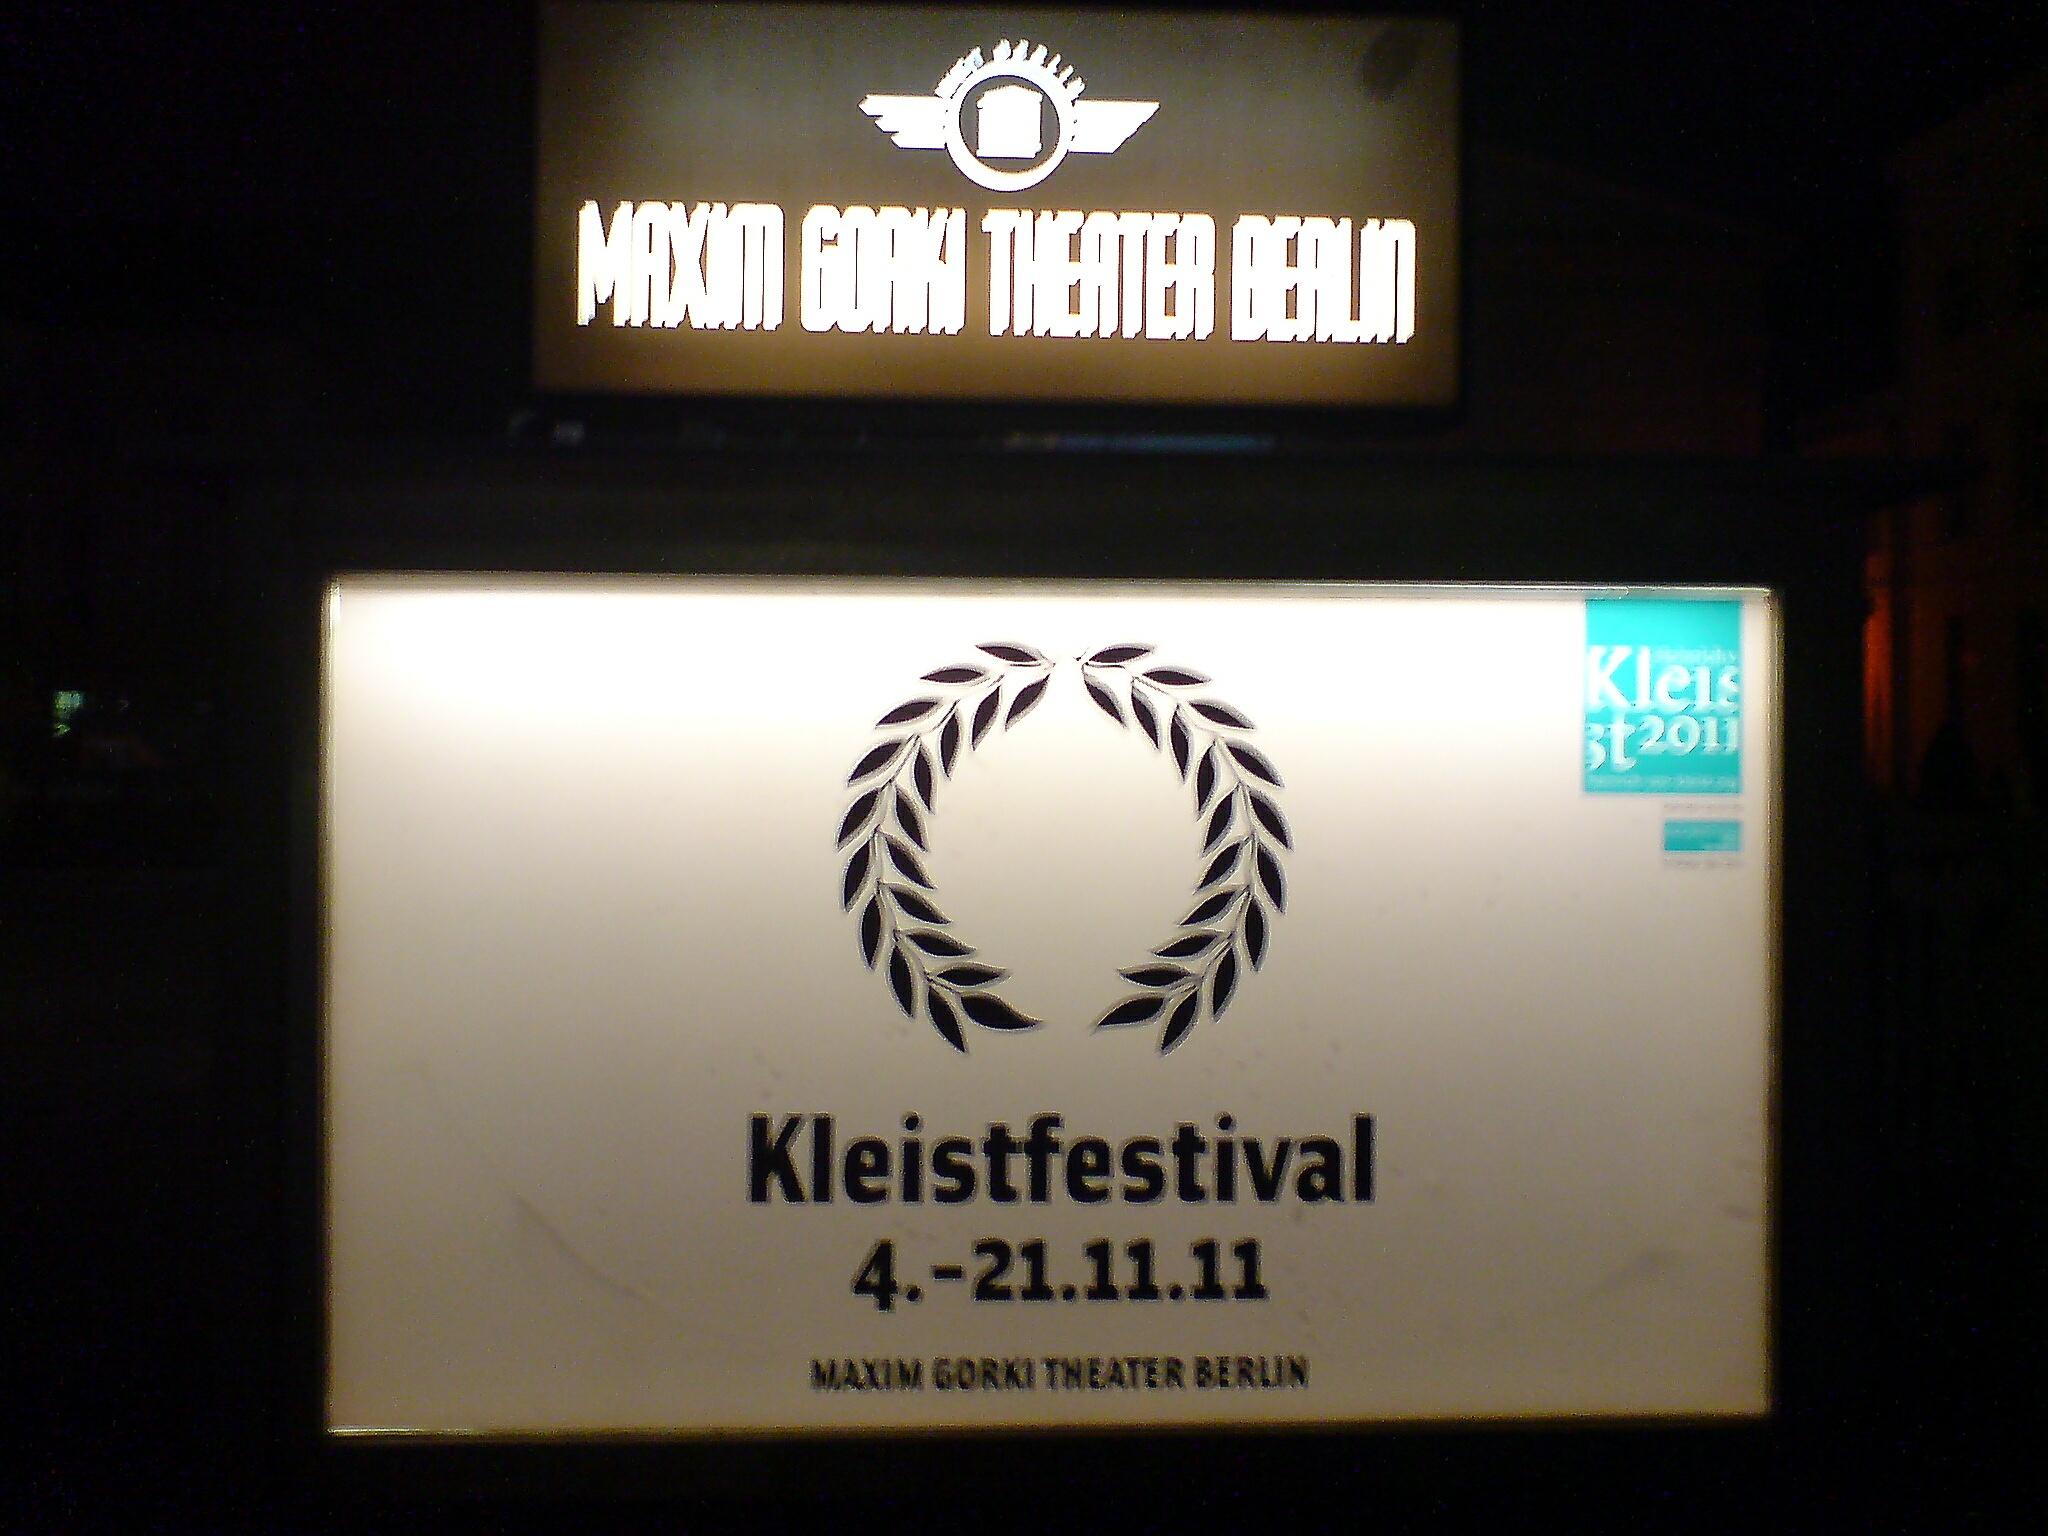 kleistfestival-gorki-2011-3.JPG